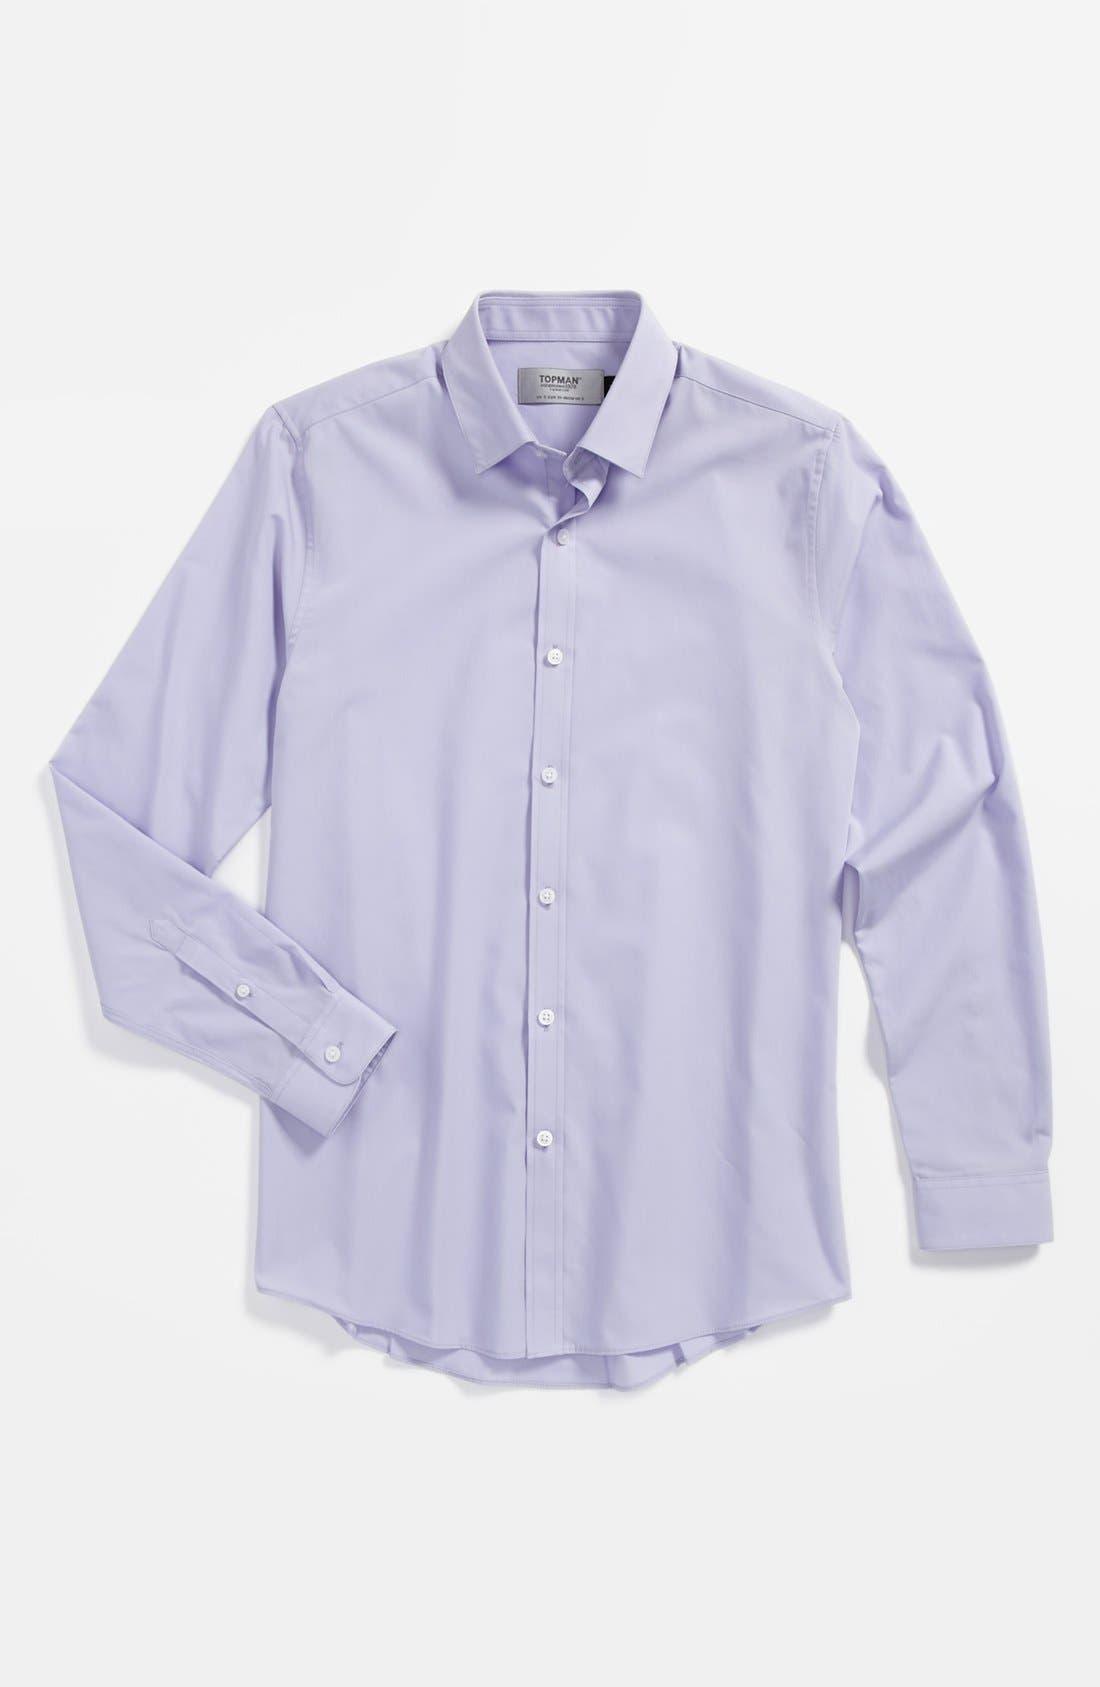 Alternate Image 1 Selected - Topman 'Smart' Dress Shirt